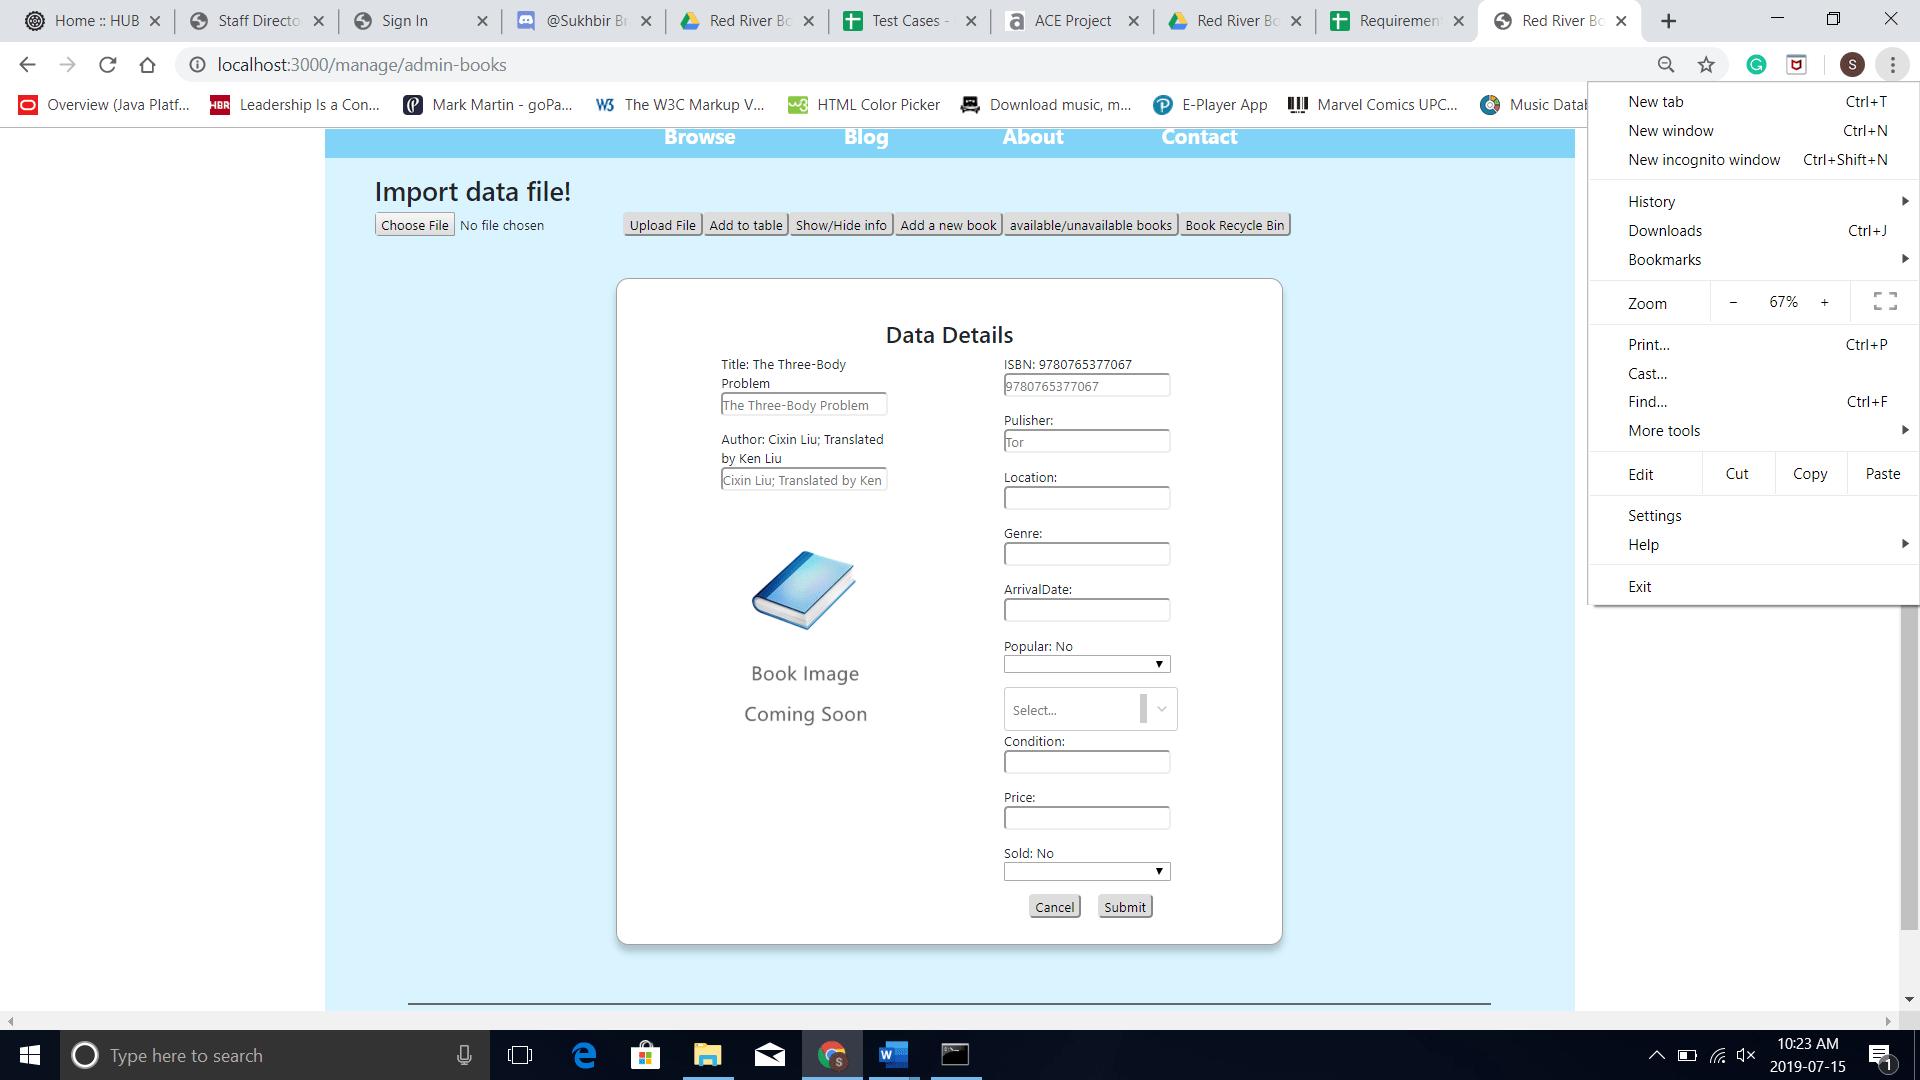 Data Details dialog box